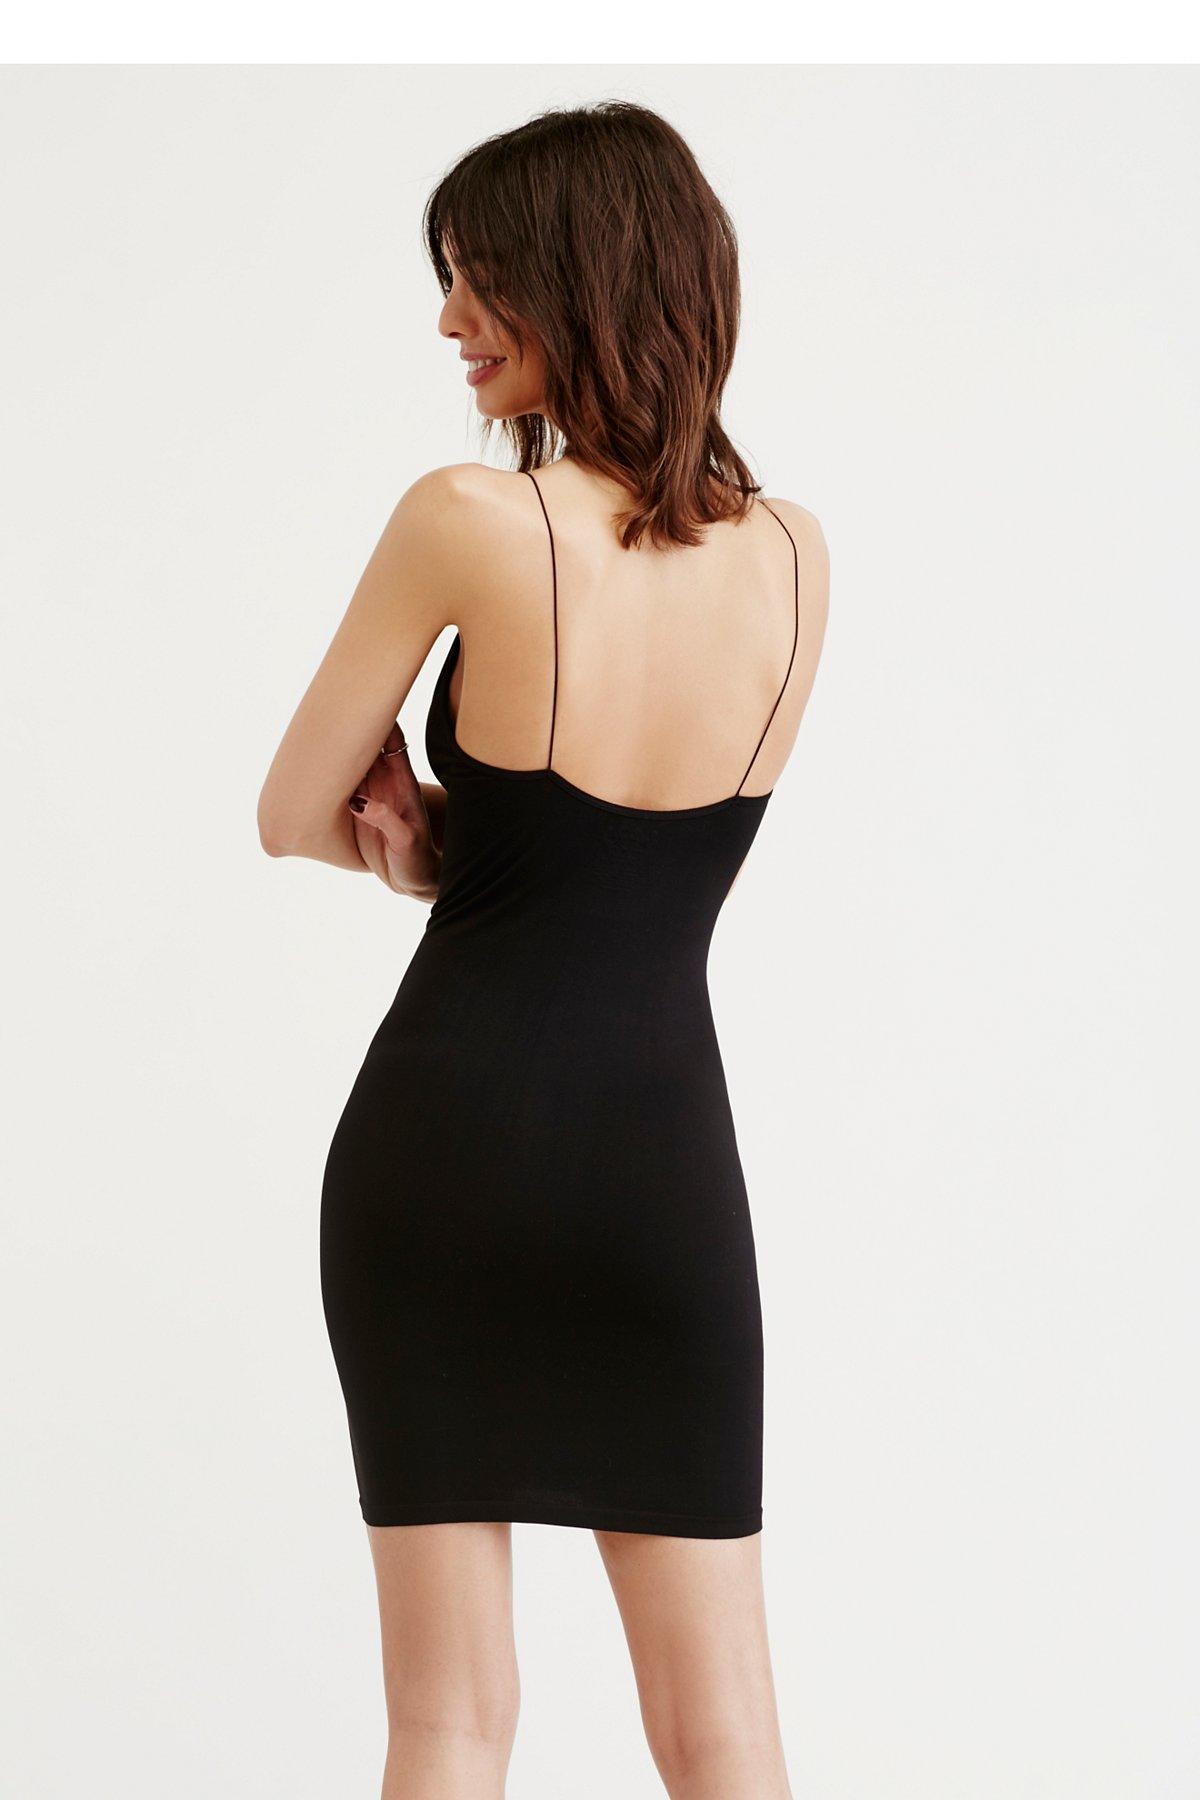 New Free People Intimately Seamless Mini Slip Bodycon Dress Womens Xs-L $30